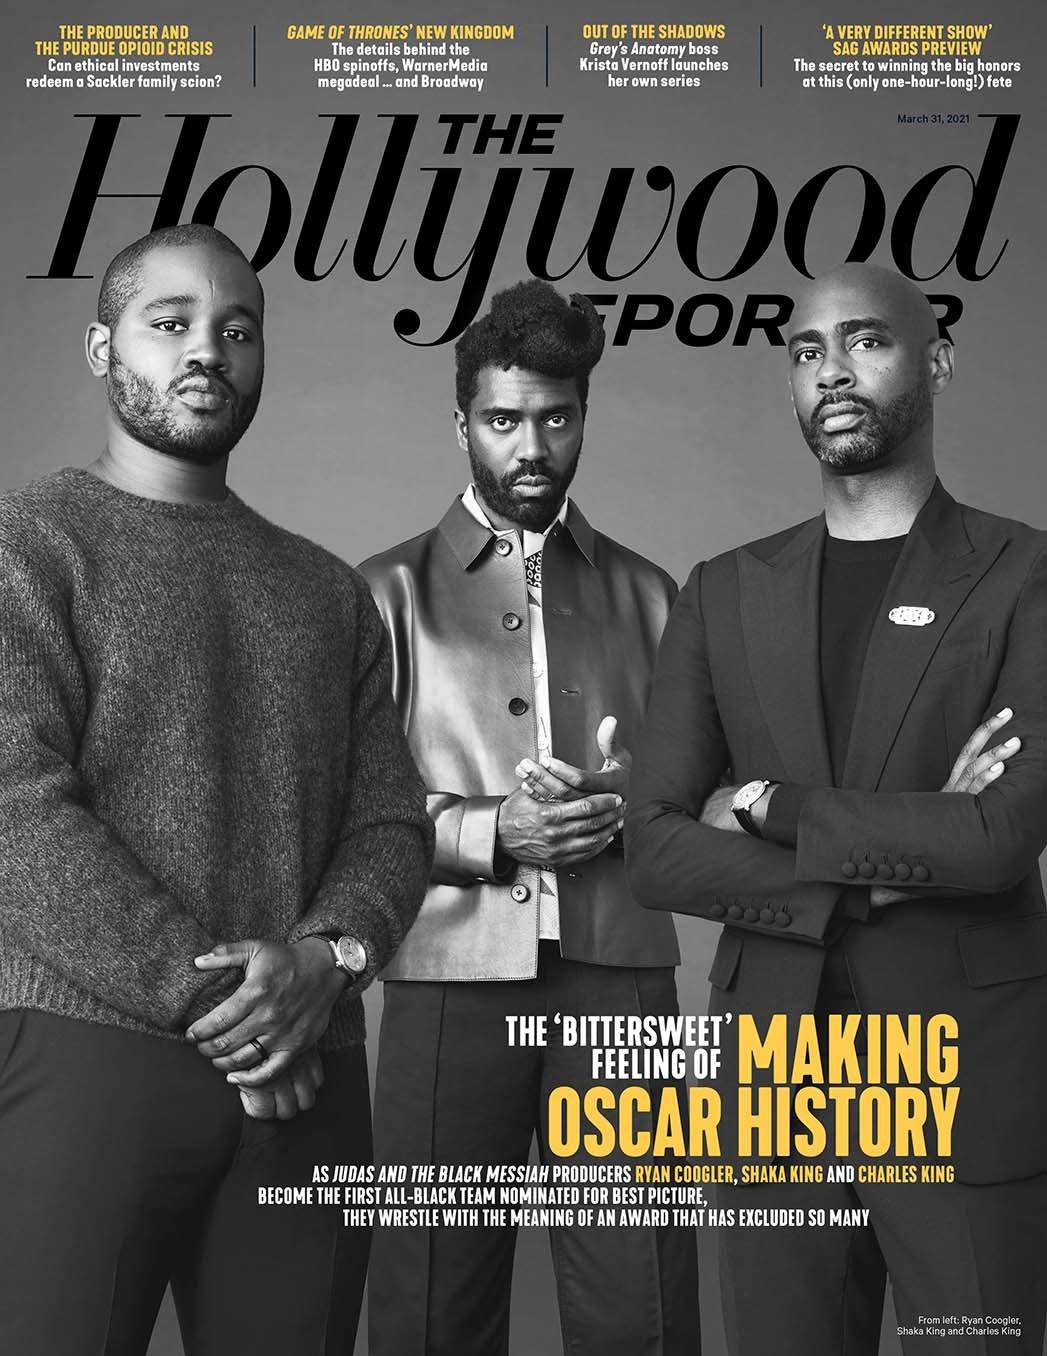 The 'Bittersweet' Feeling of Making Oscar History